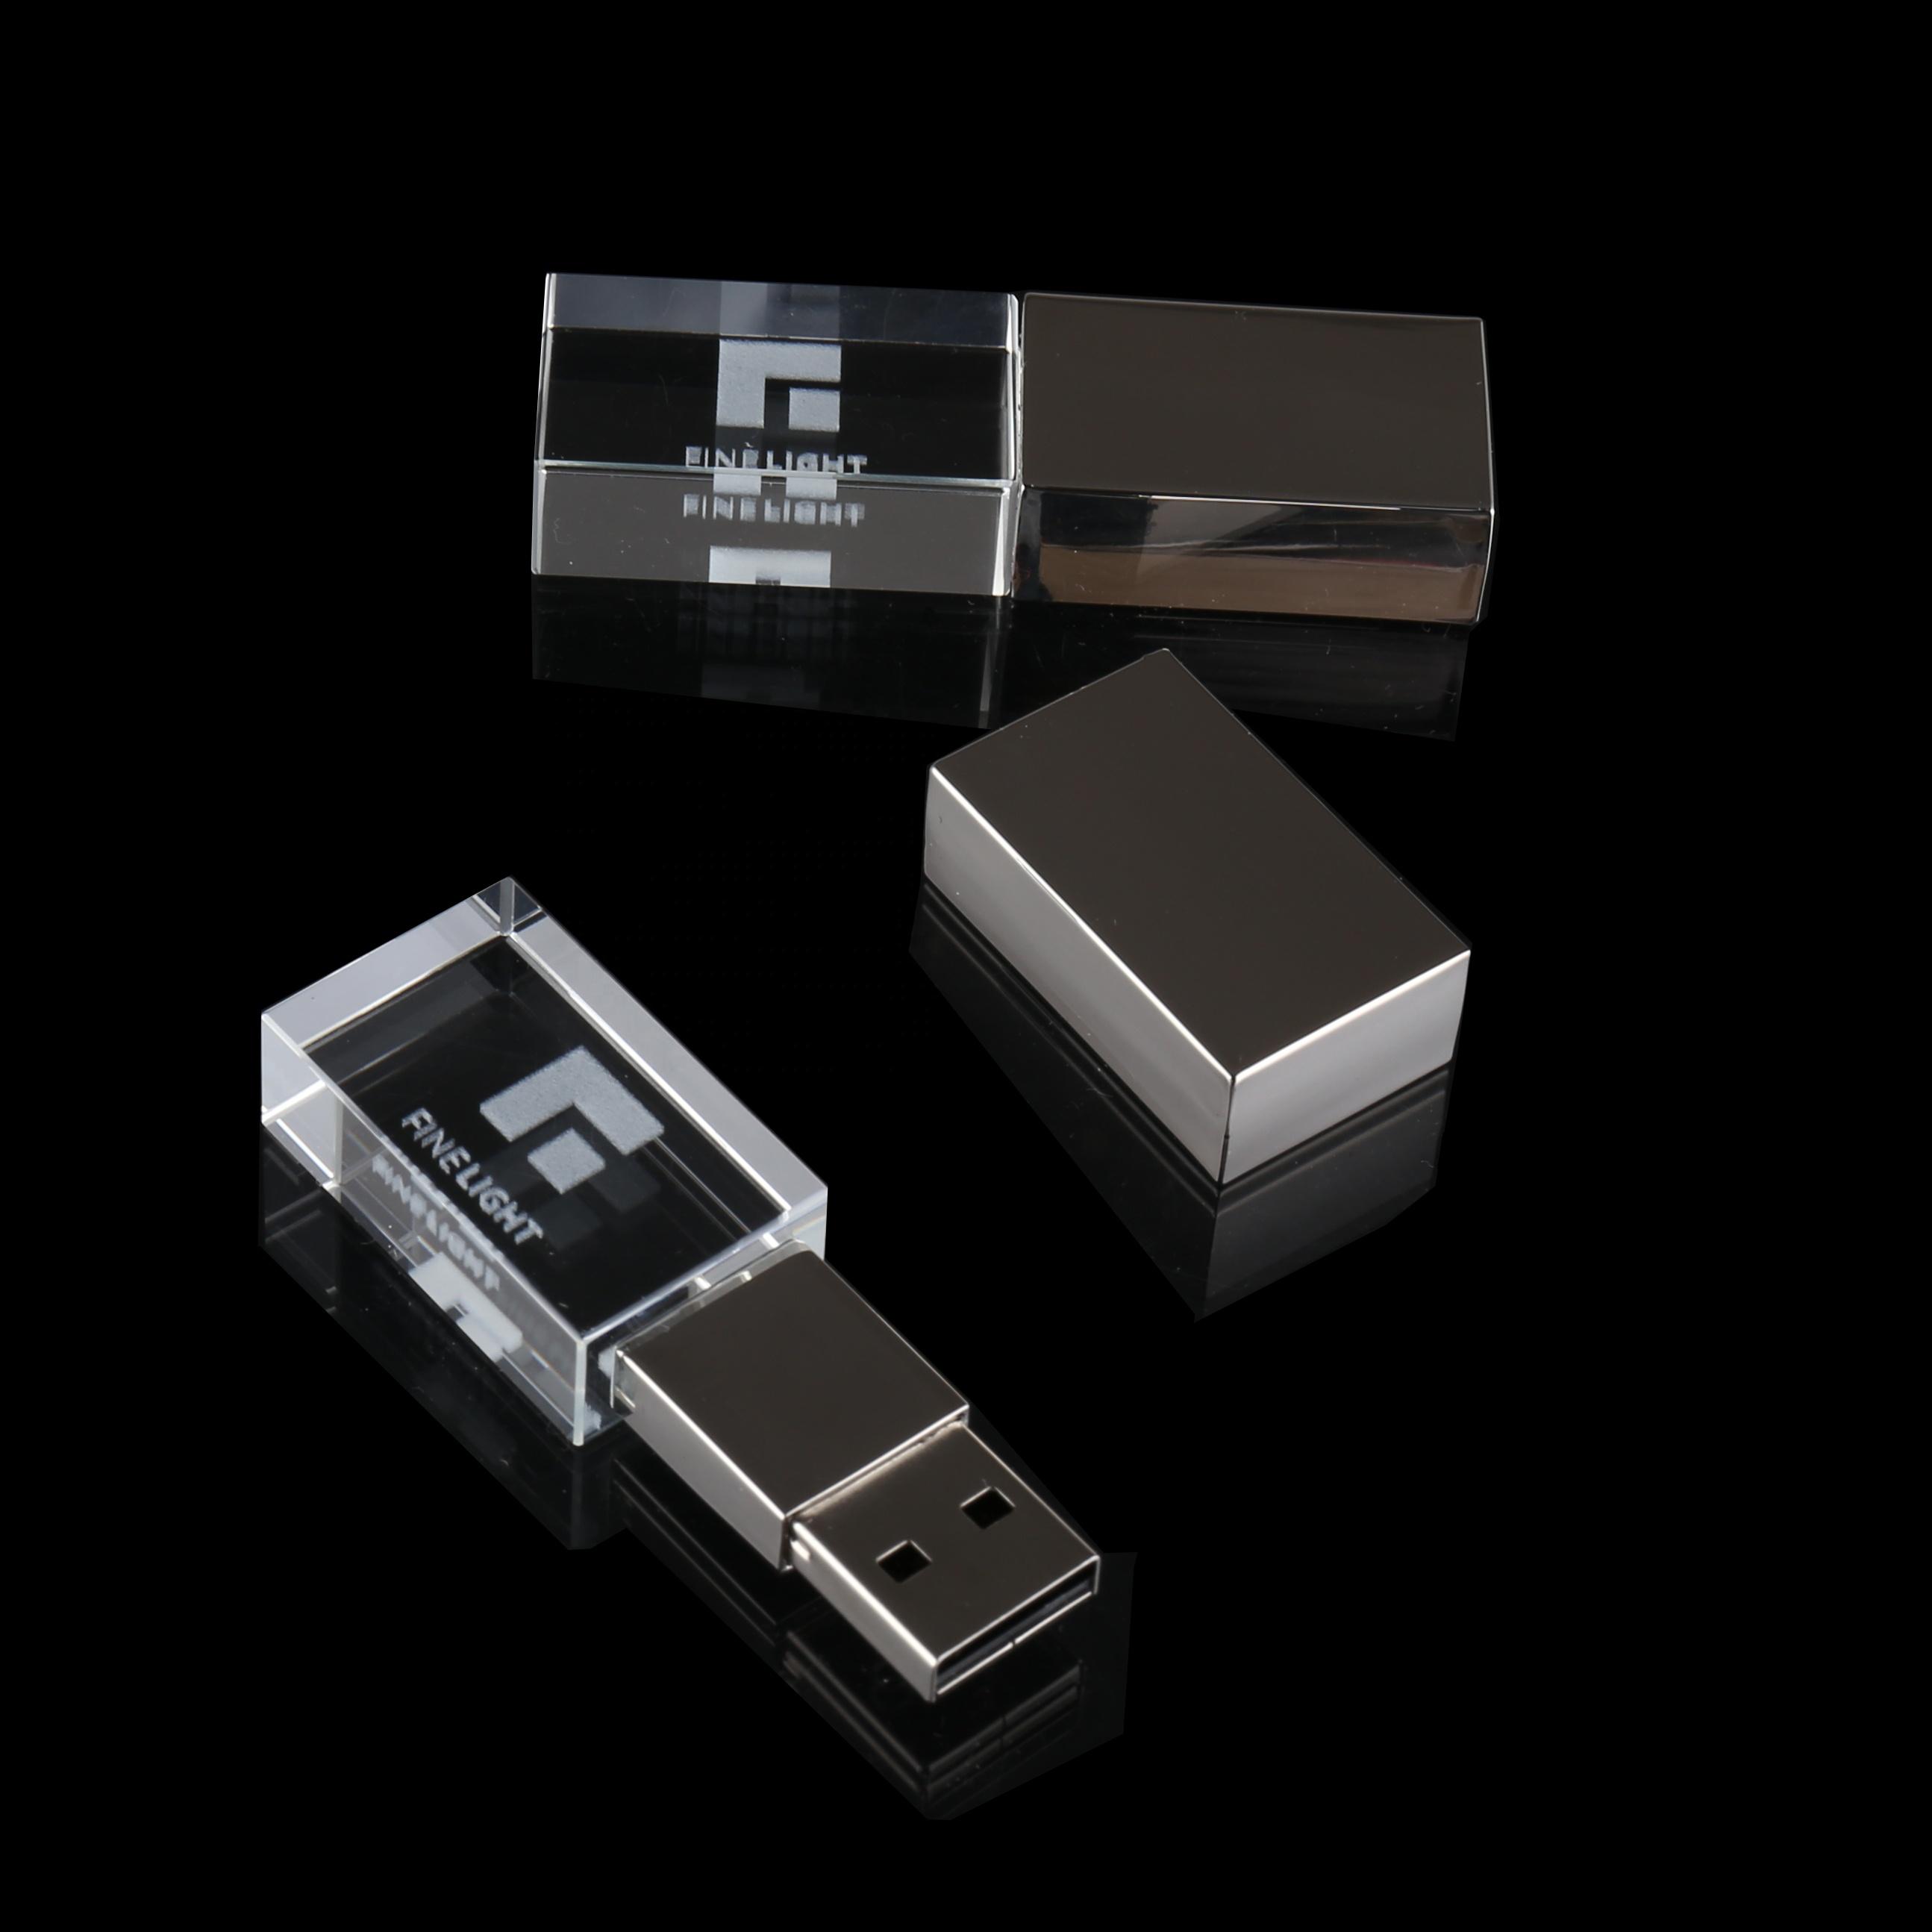 Promotional Gift LED Light 4GB 8GB 16GB 32GB 64GB Crystal USB Flash Drive Pen Drive wholesale - USBSKY | USBSKY.NET